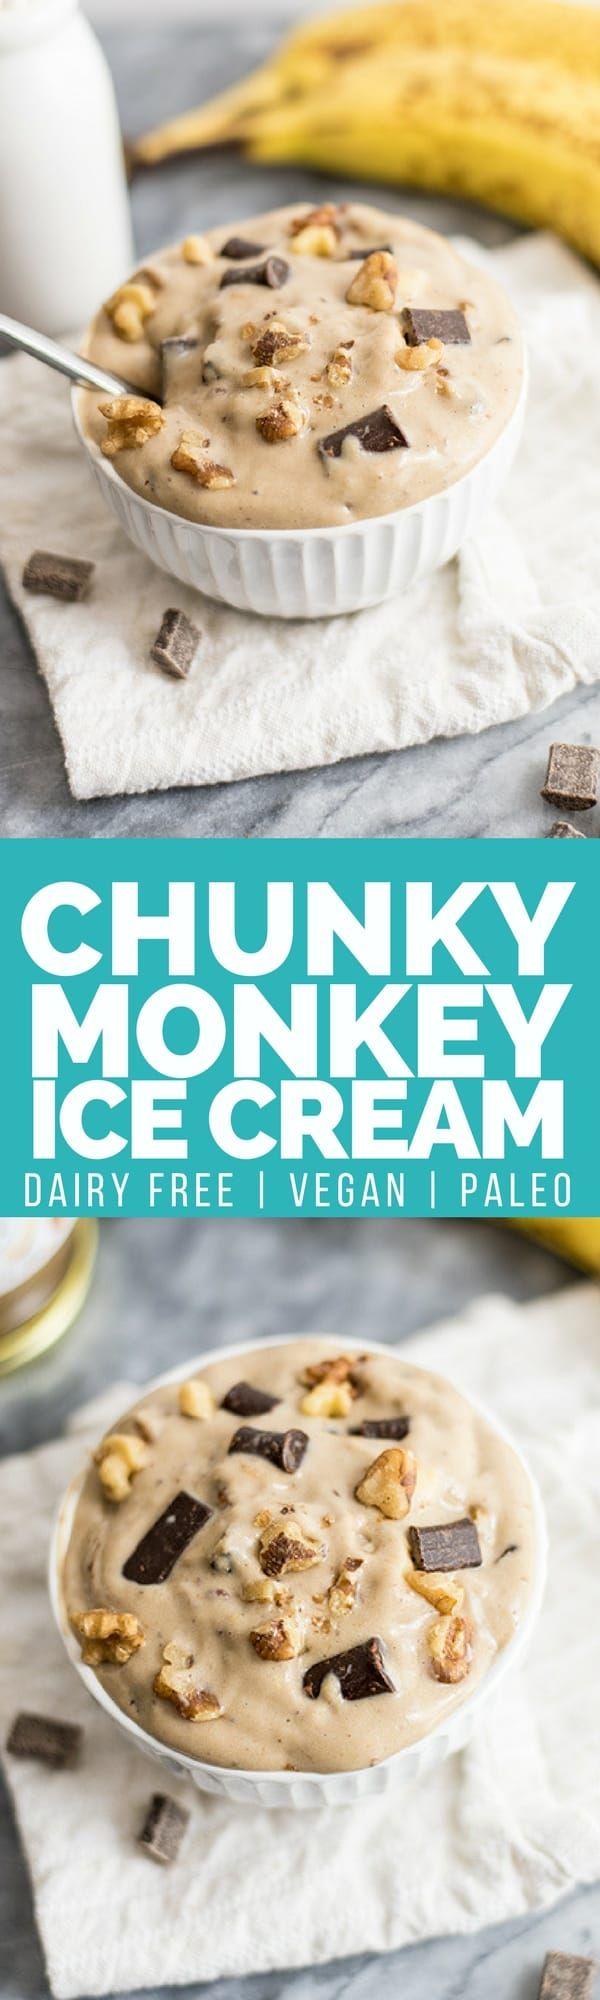 15912 best Budget recipes images on Pinterest   Healthy meals, Vegan ...